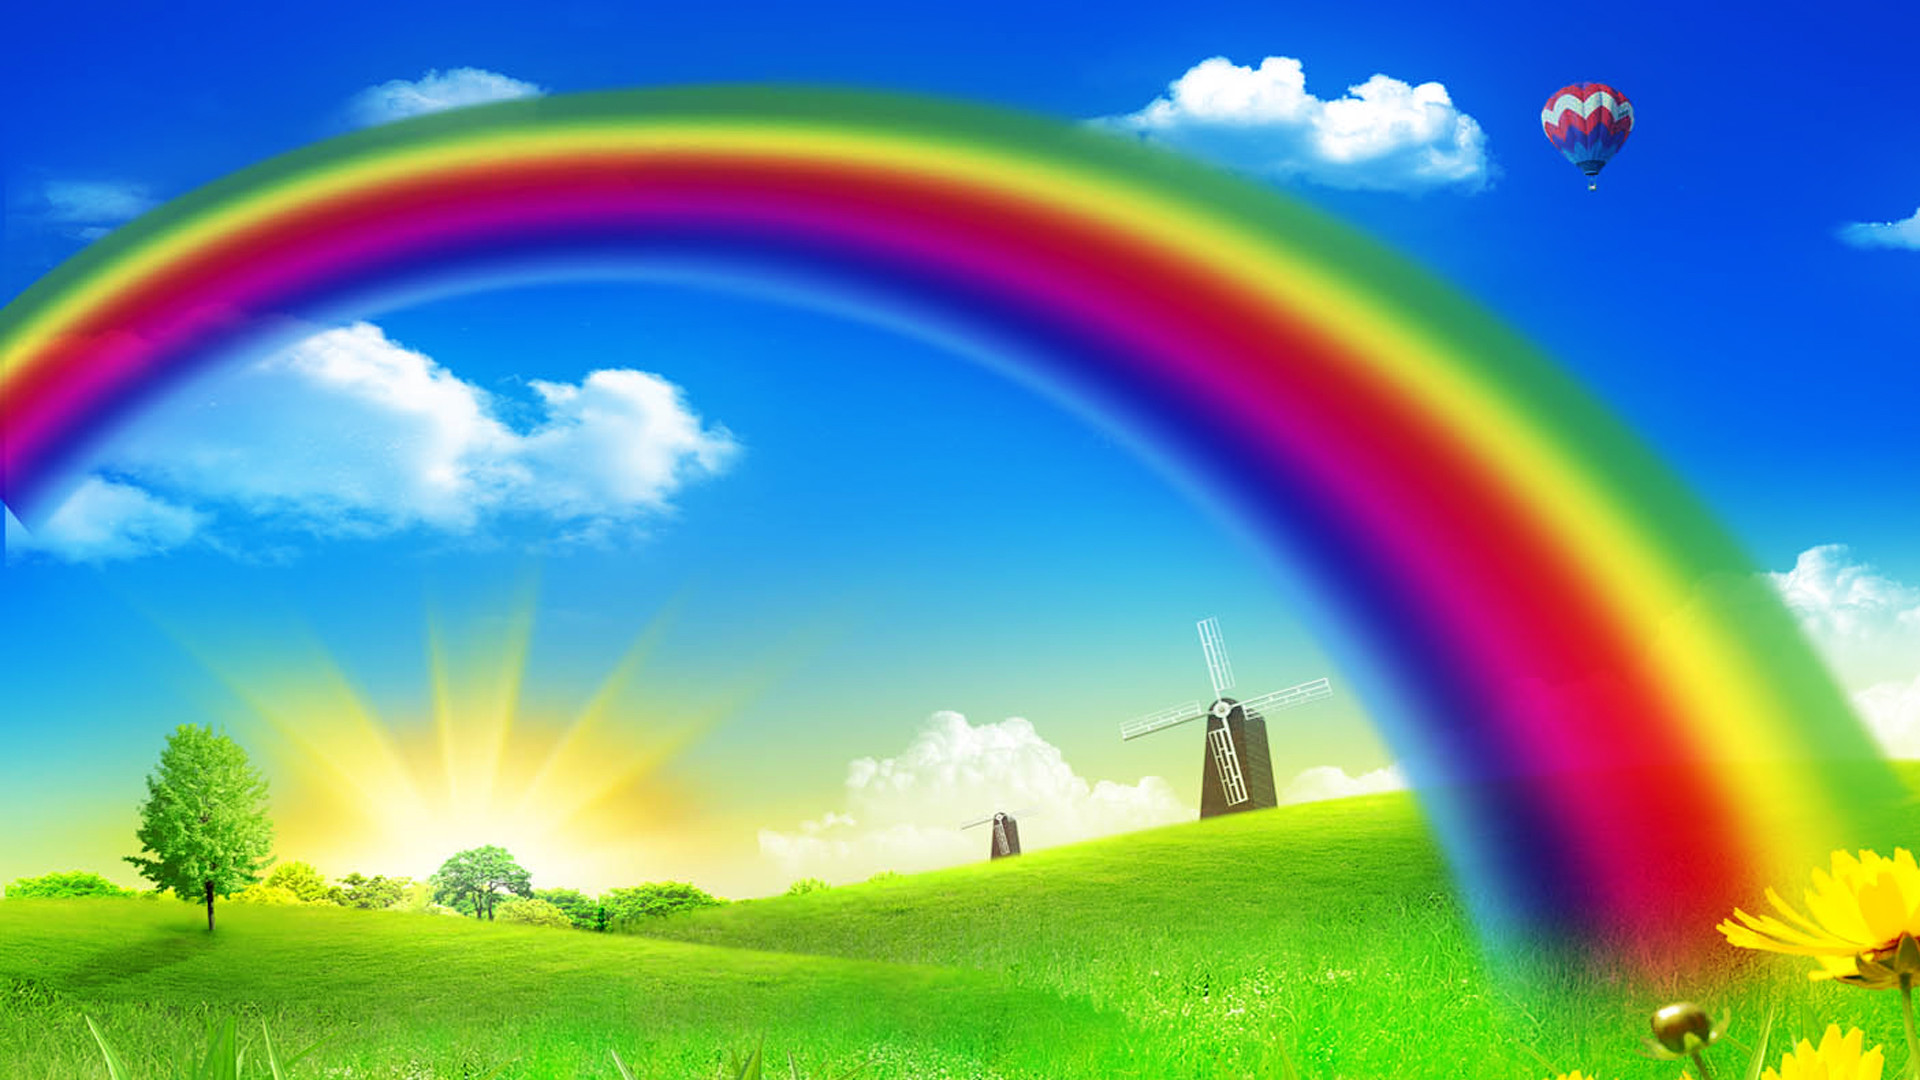 Rainbow Wallpaper: Rainbow Color Wallpaper (71+ Images